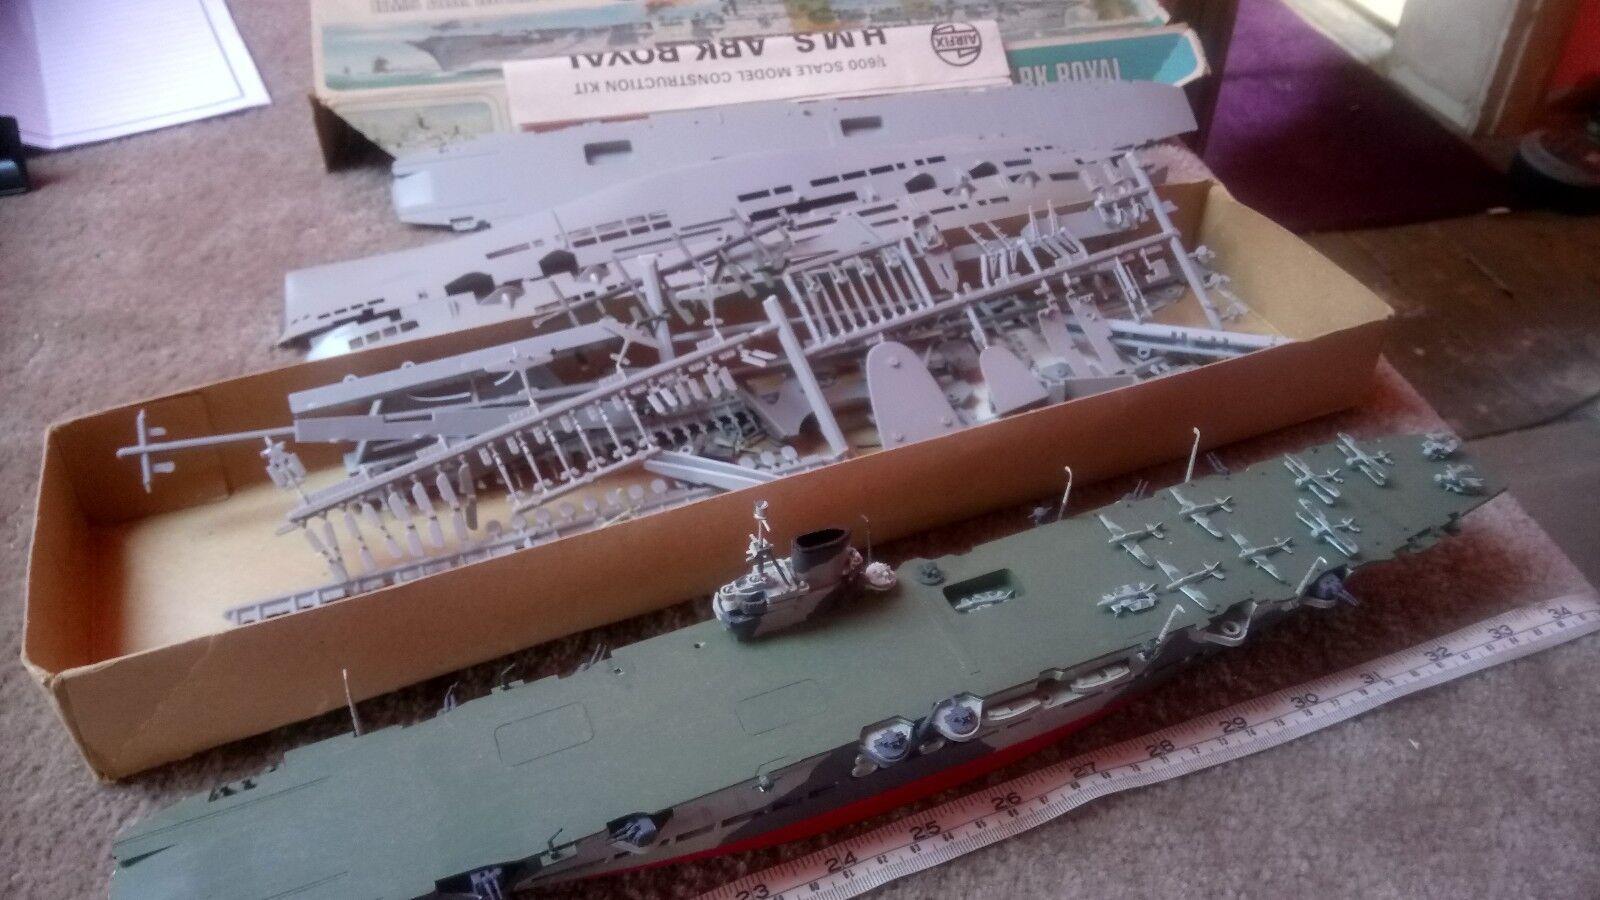 1 600 HMS ARK ROYAL CARRIER WW2 (x2) BUILT & UNBUILT LOT SCRAP SPARES OR REPAIR.